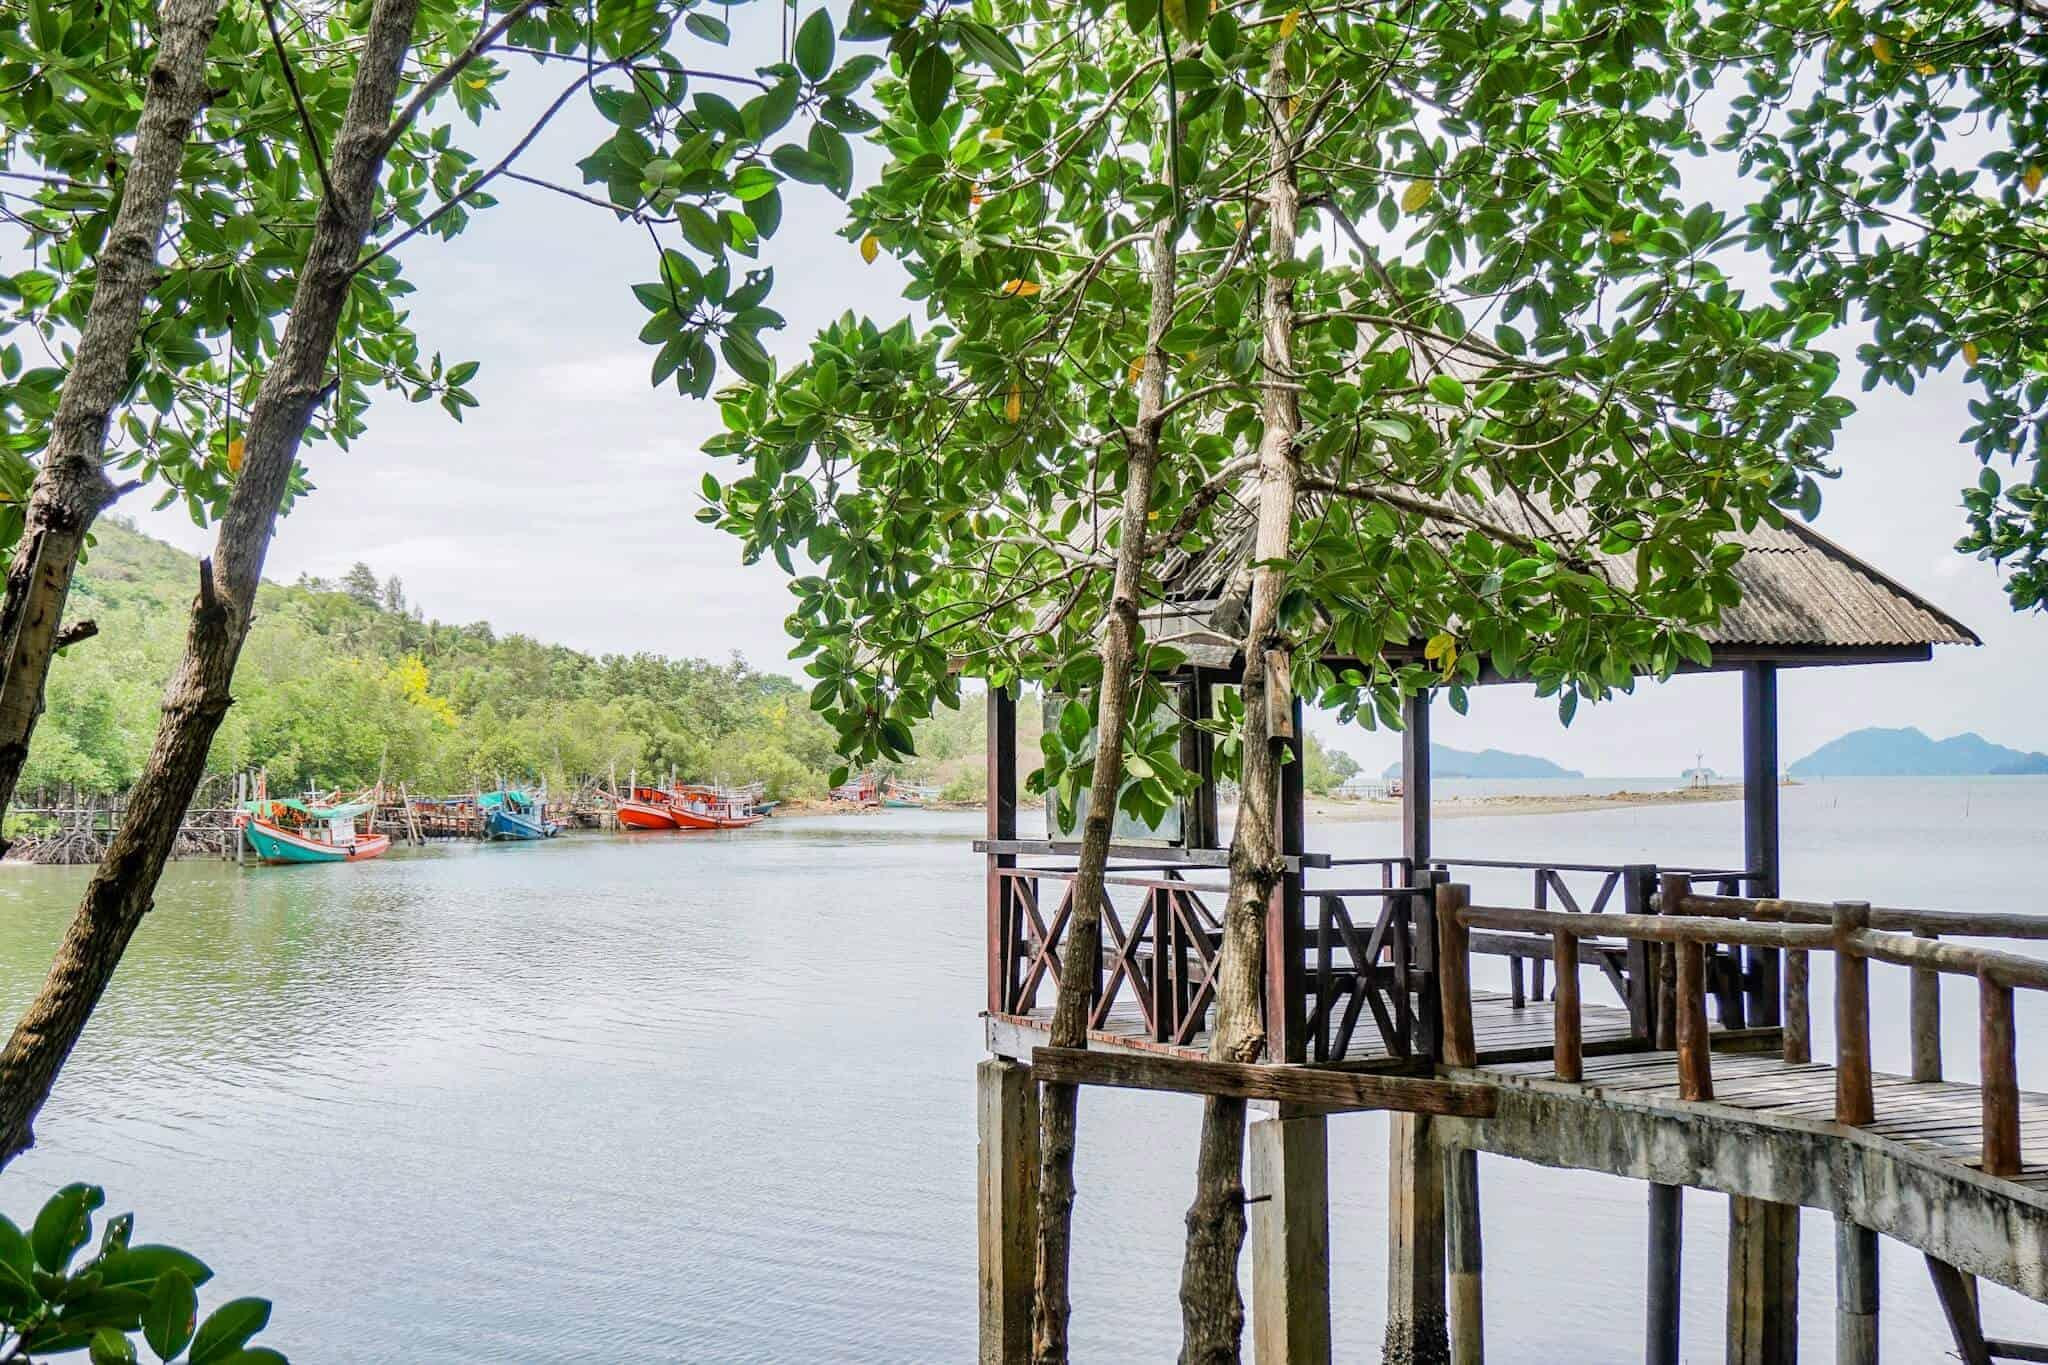 Mu Koh Chumphon National Park – The Mangroves